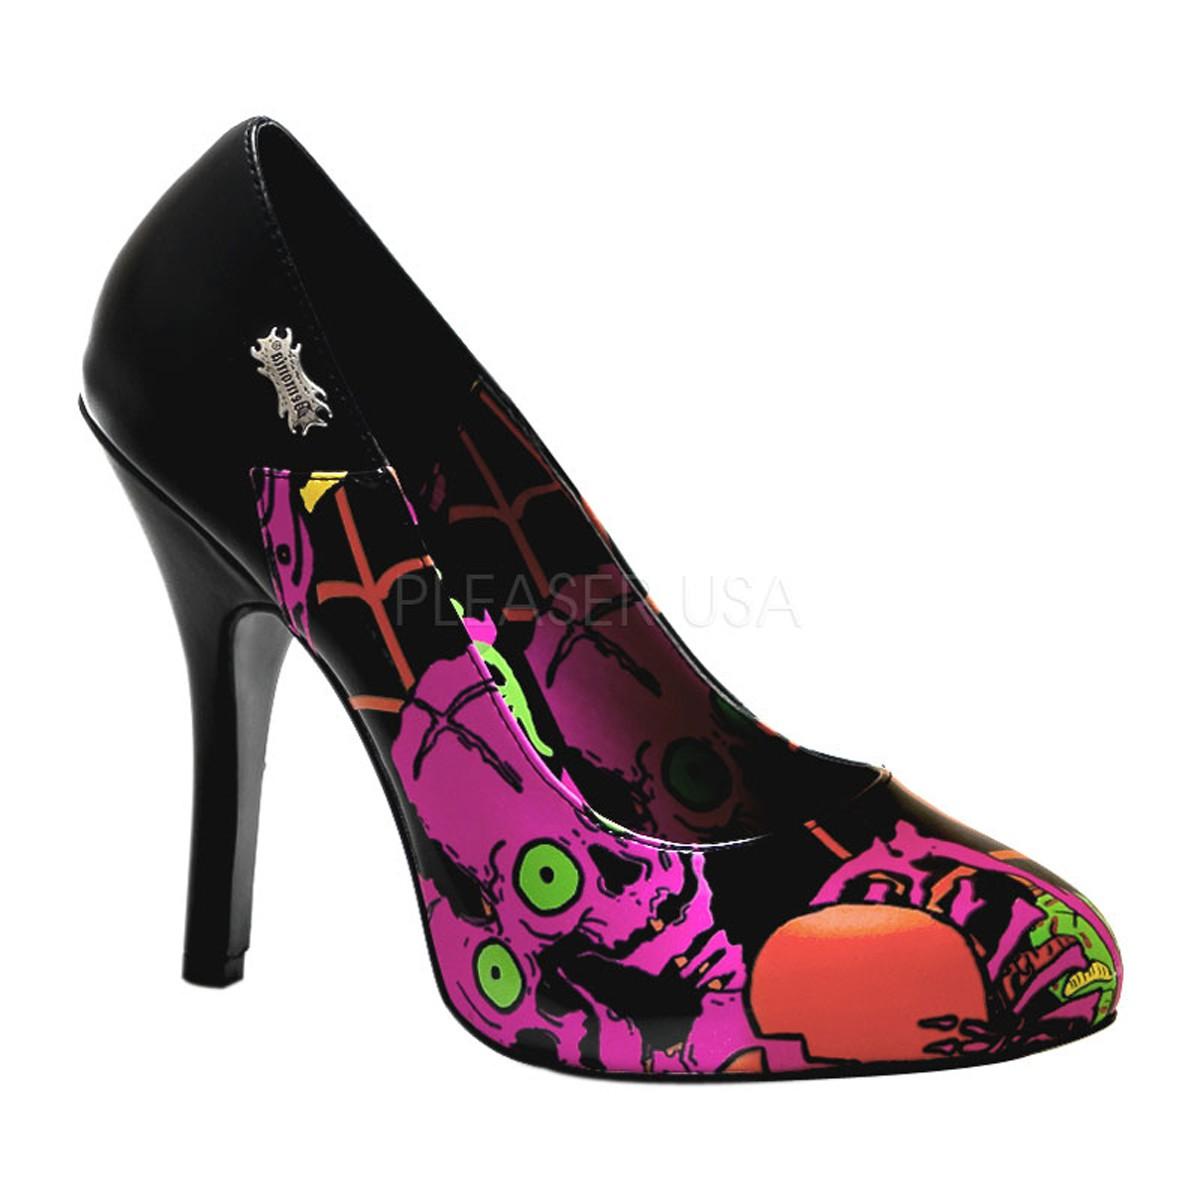 Demonia Zombie-02 - Gothic Punk Industrial Motiv-Print Schuhe 36-43